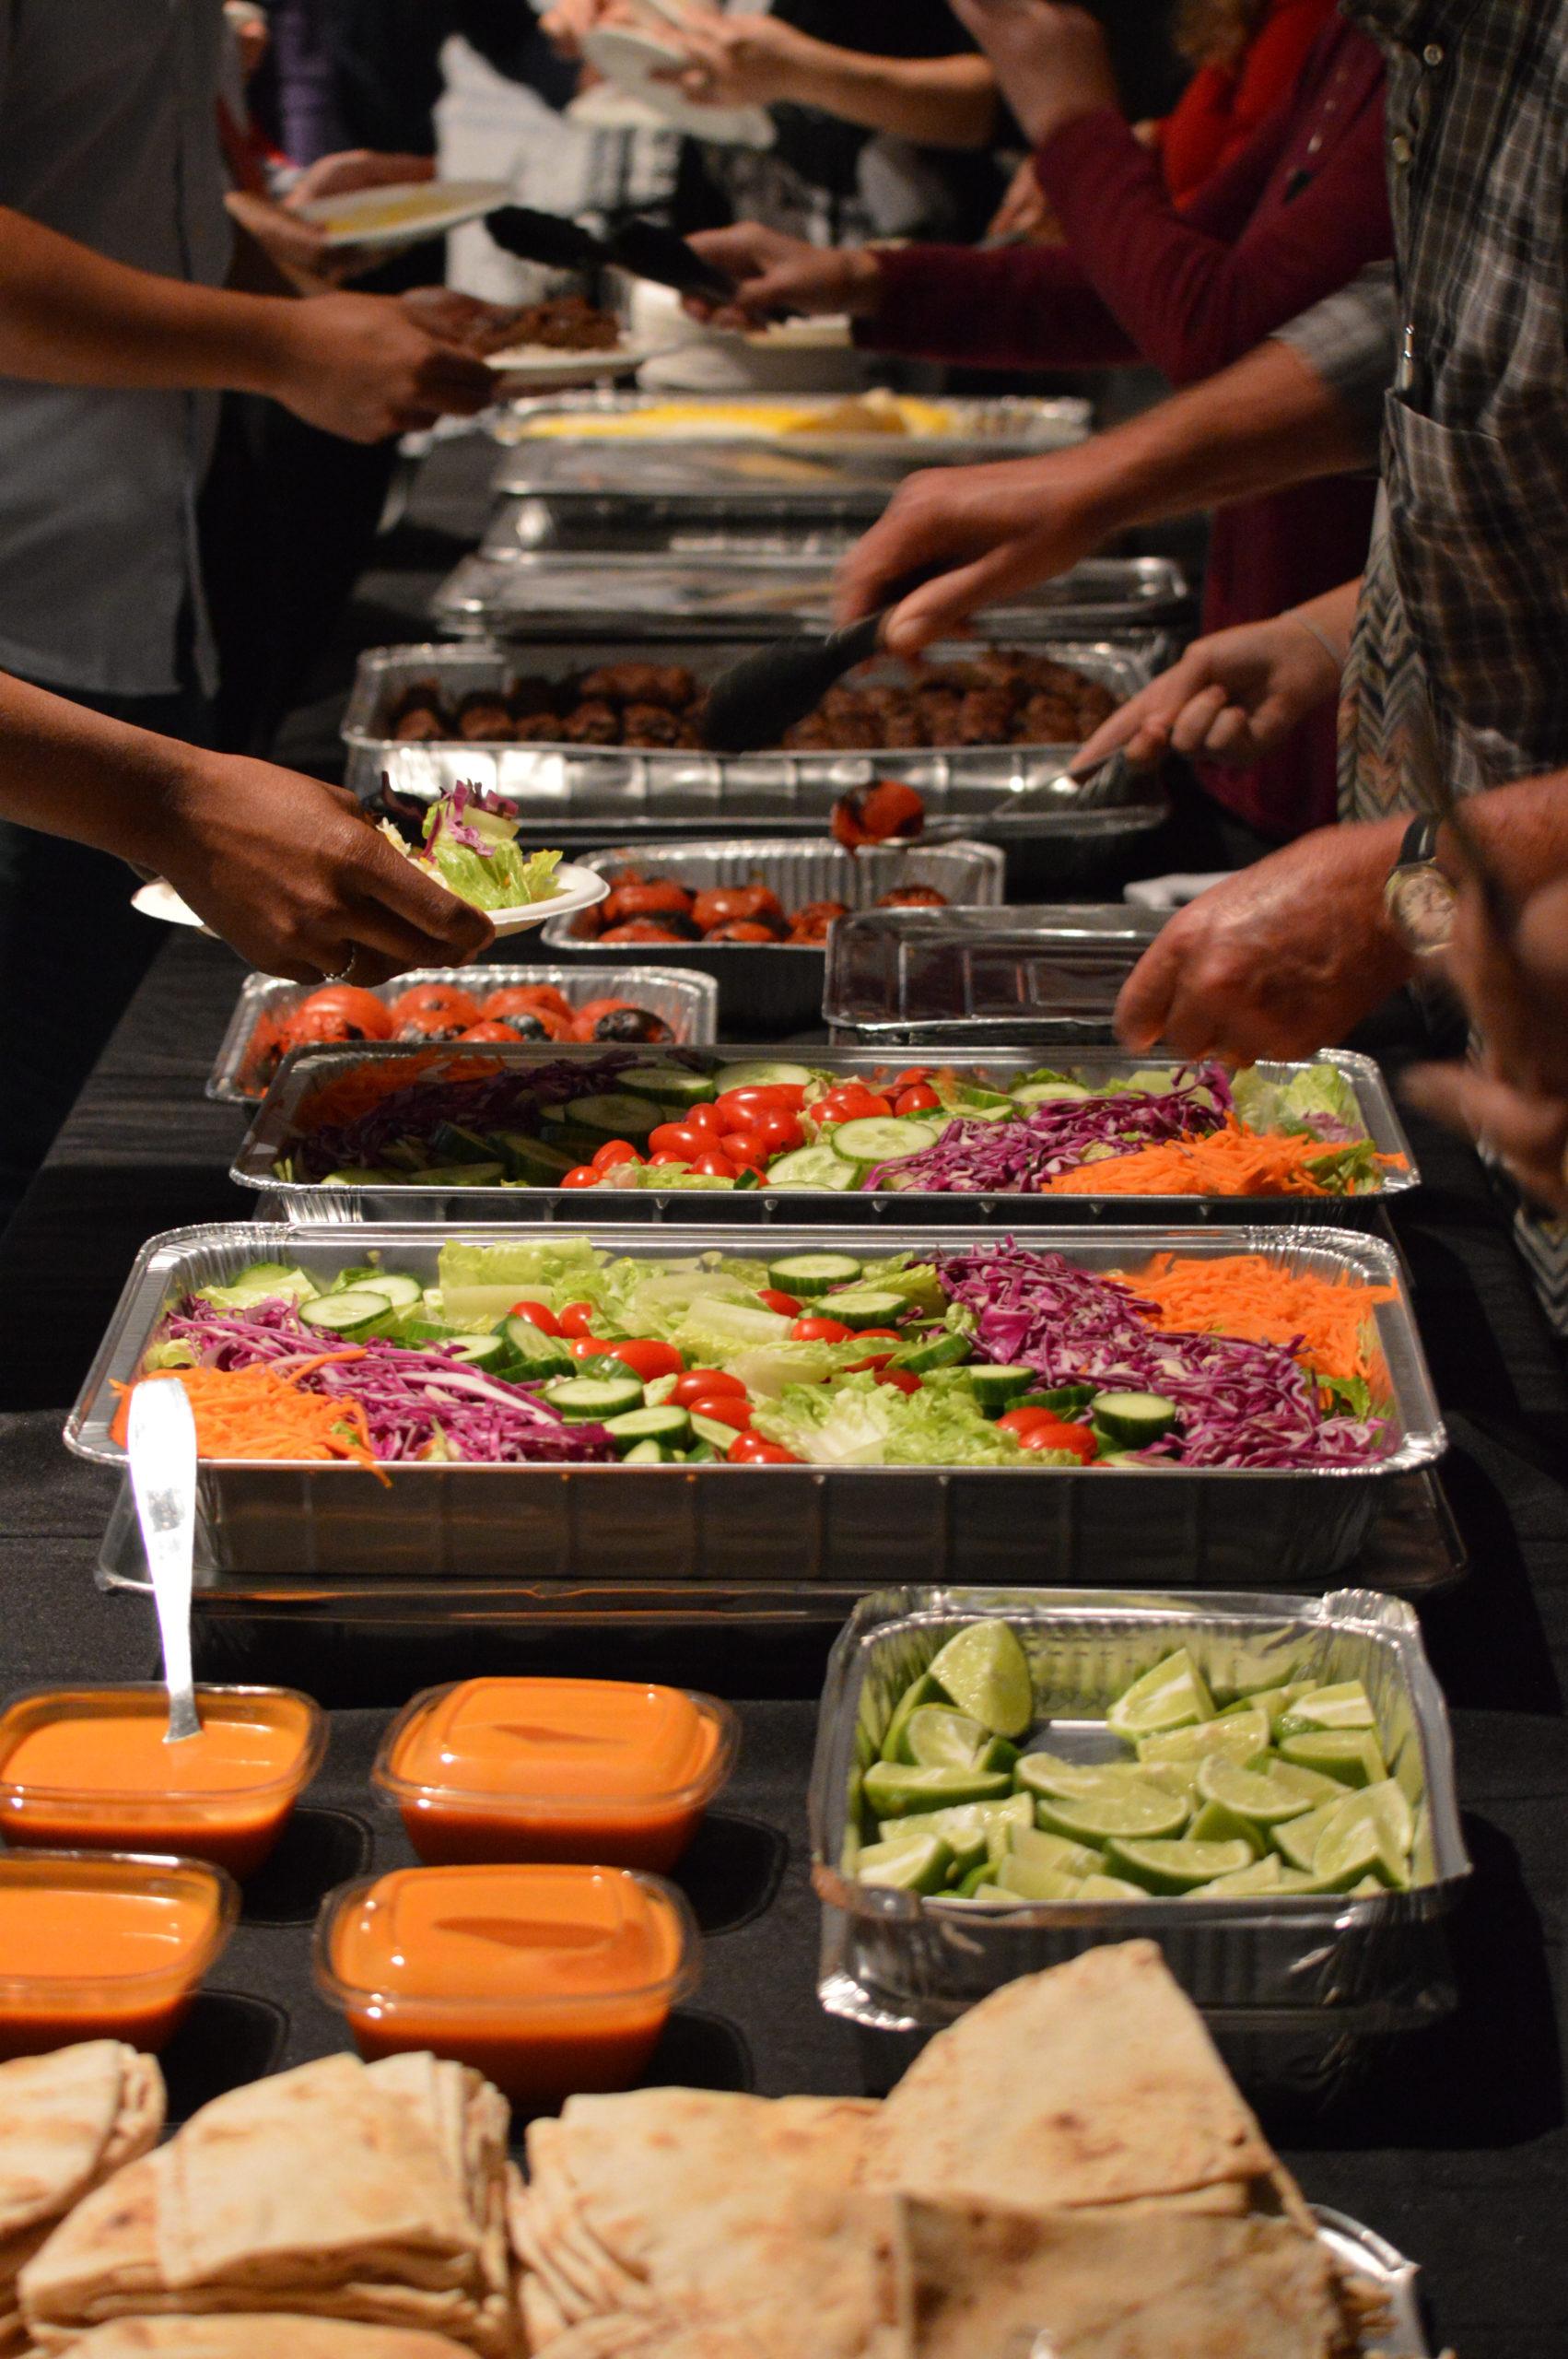 banquet food